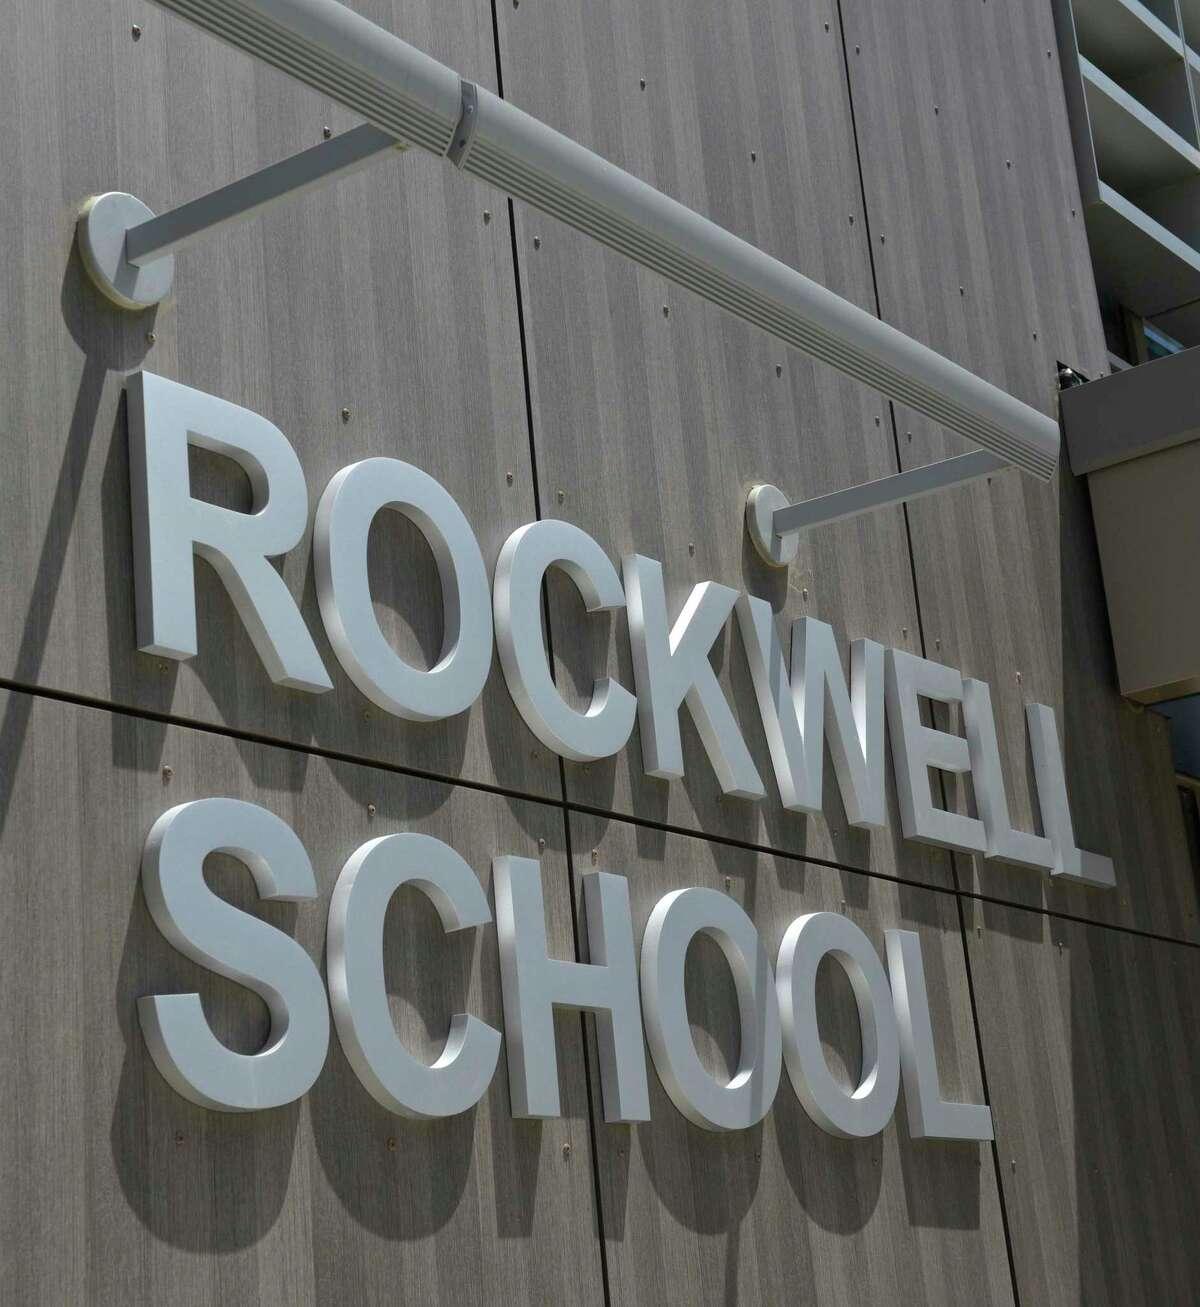 Anna H. Rockwell School in Bethel, Conn.